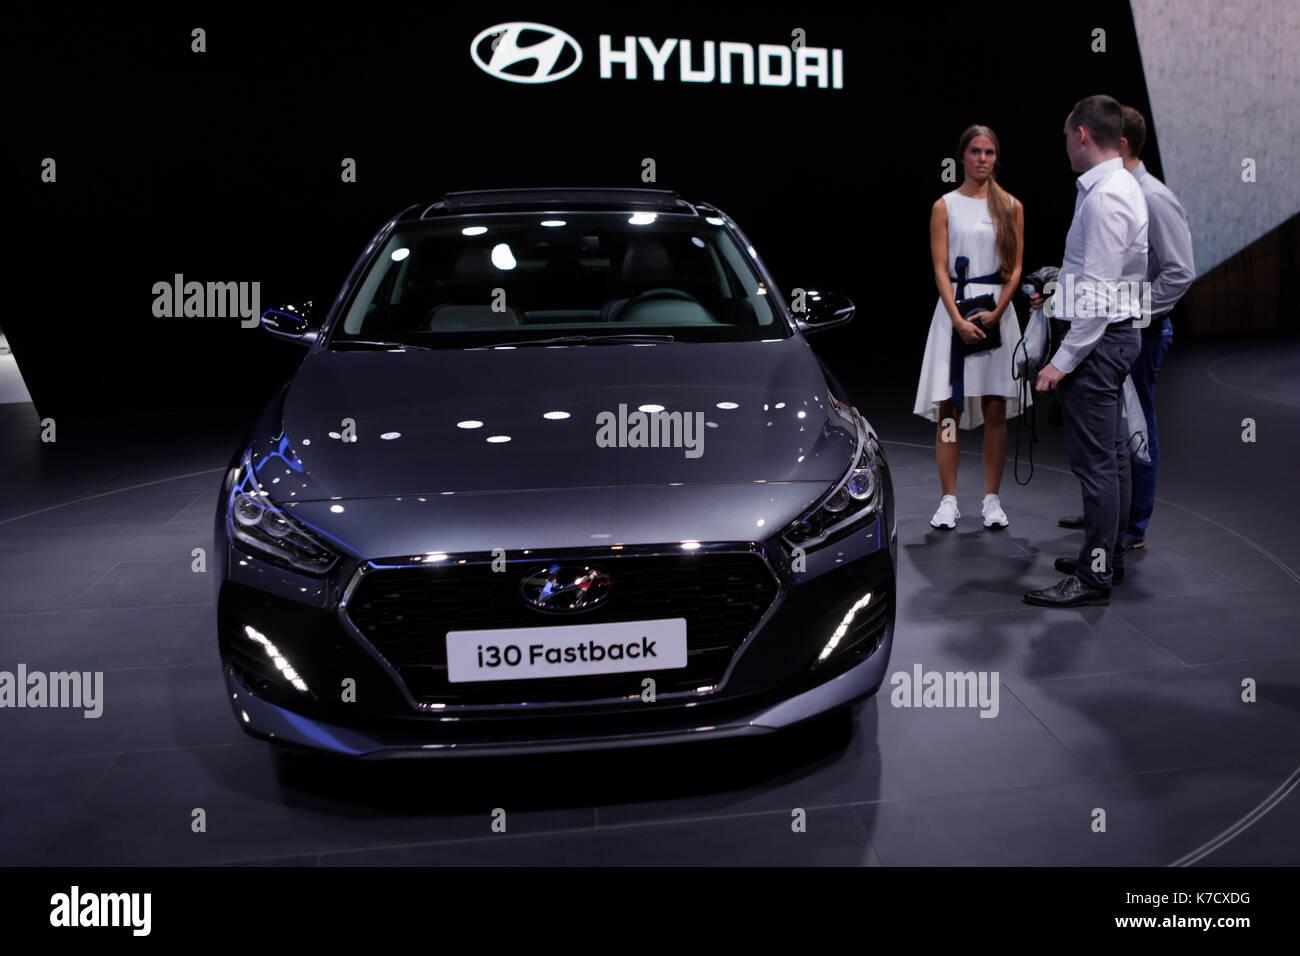 the korean car manufacturer hyundai presents the hyundai i30 fastback stock photo royalty free. Black Bedroom Furniture Sets. Home Design Ideas